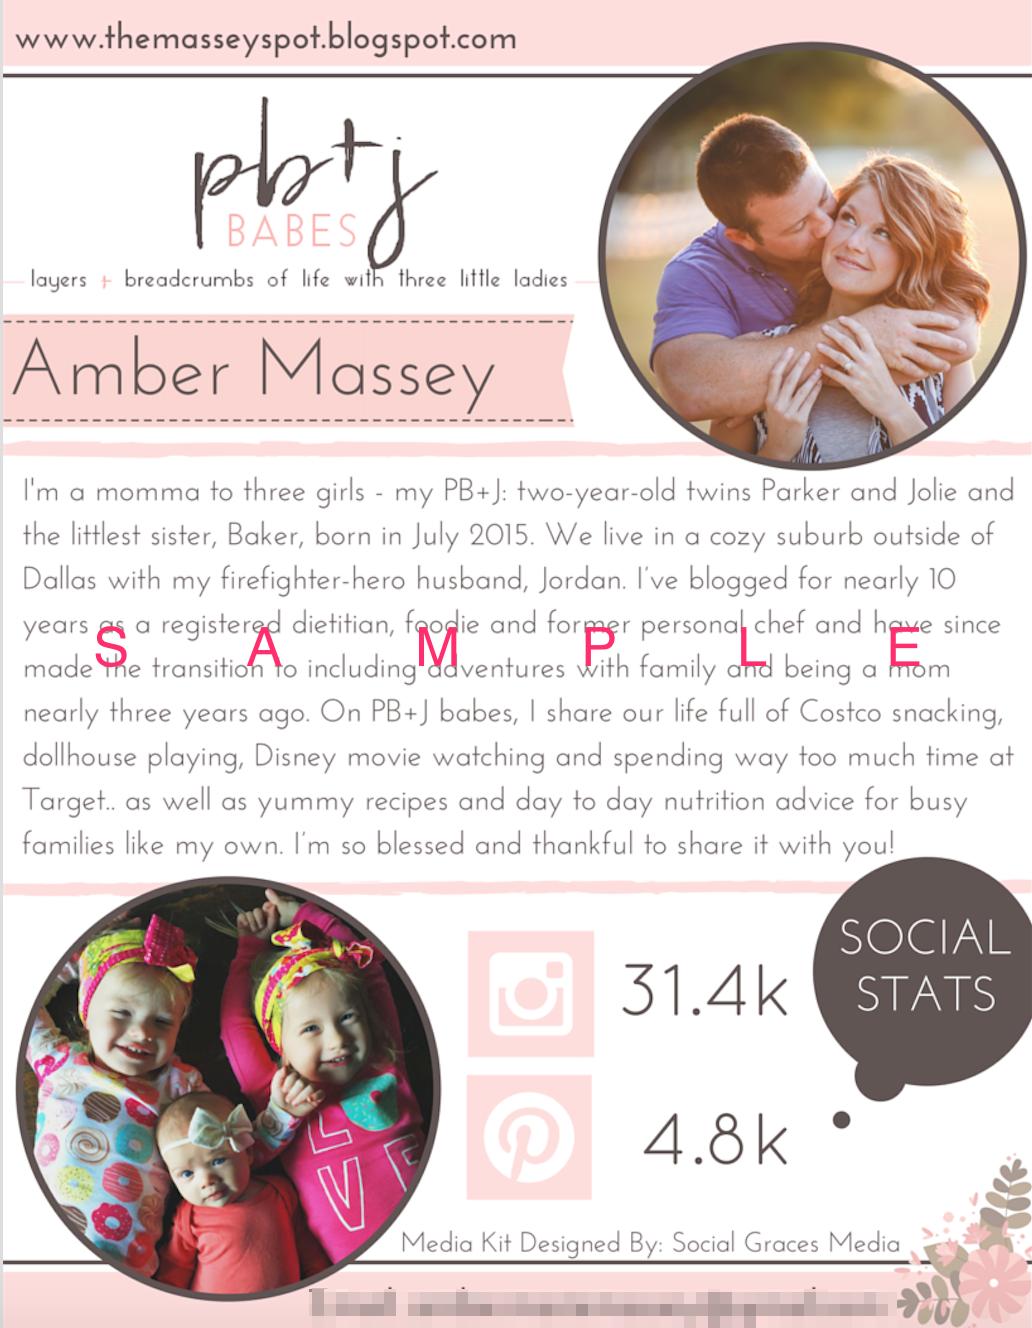 Media Kit Sample (Page 1) -Designed By Social Graces Media